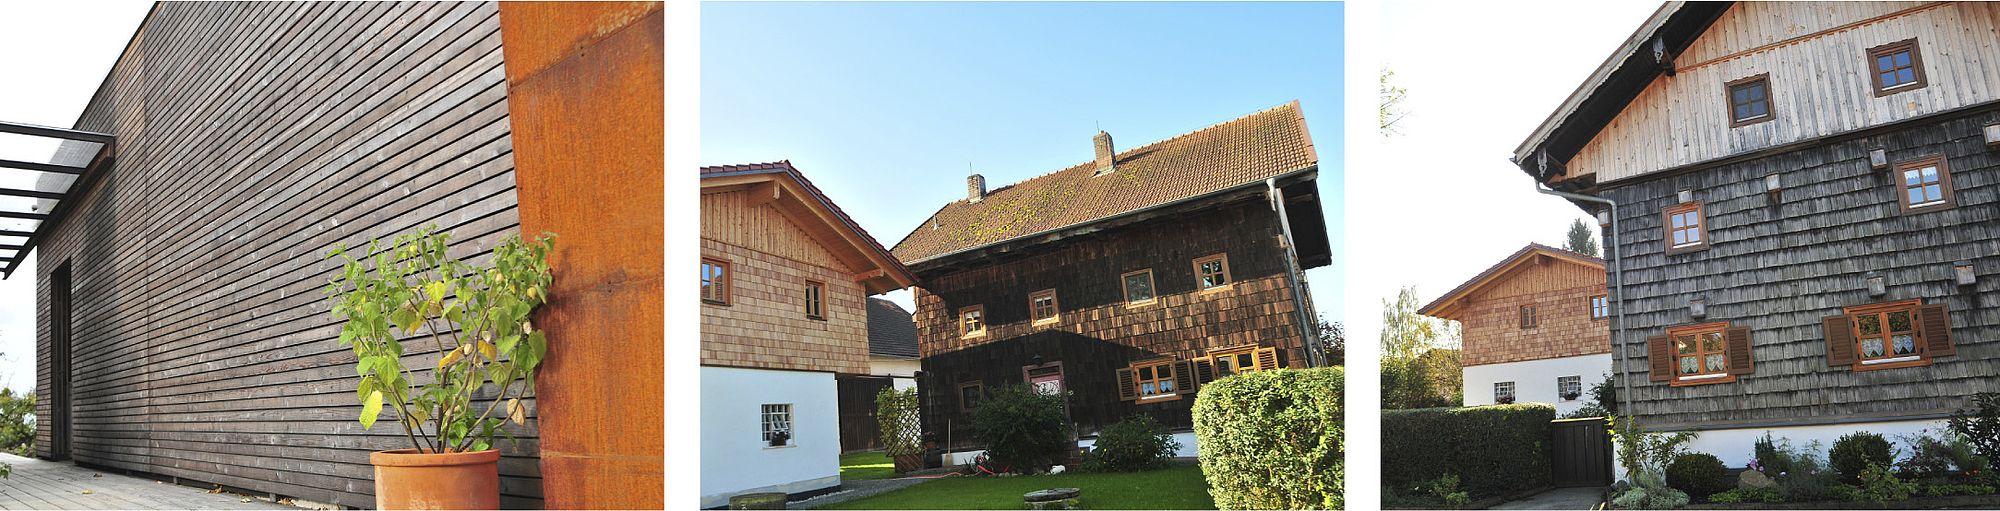 das brunthaler baumhaus | brunthaler massivholzhaus